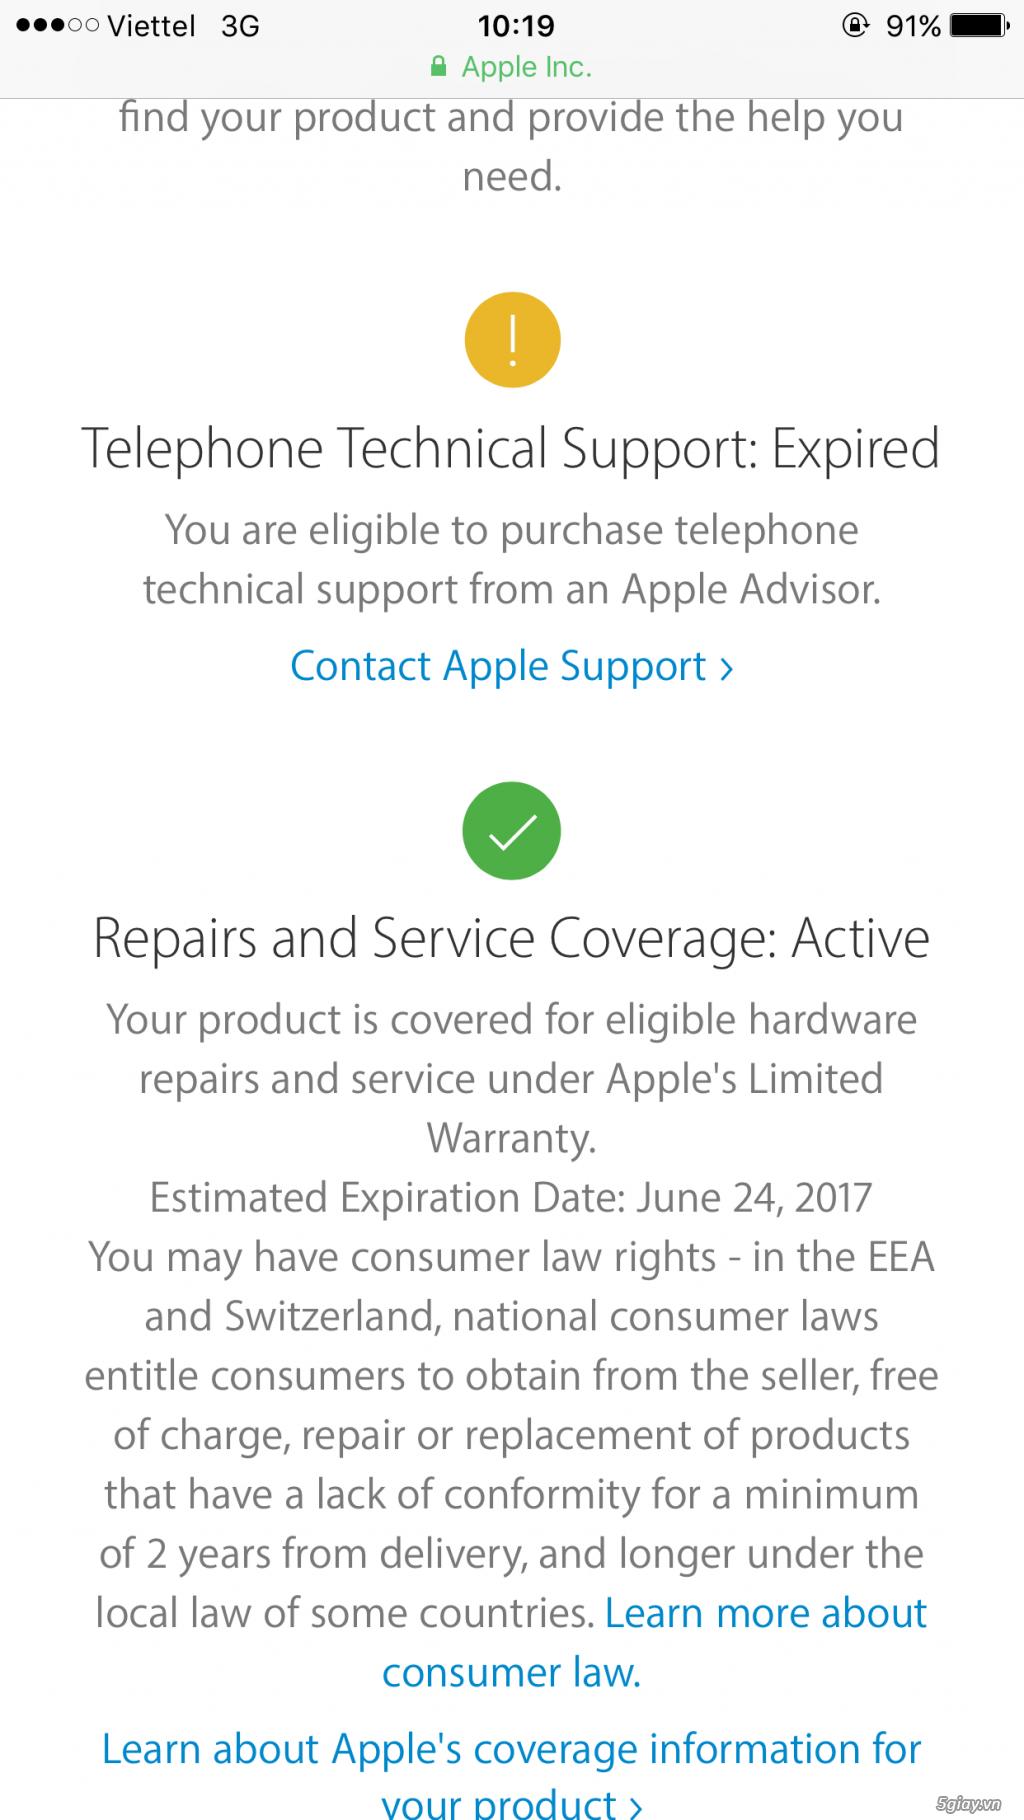 Bán iphone 6s plus 16gb 99% còn BH apple gần 7 tháng. - 1